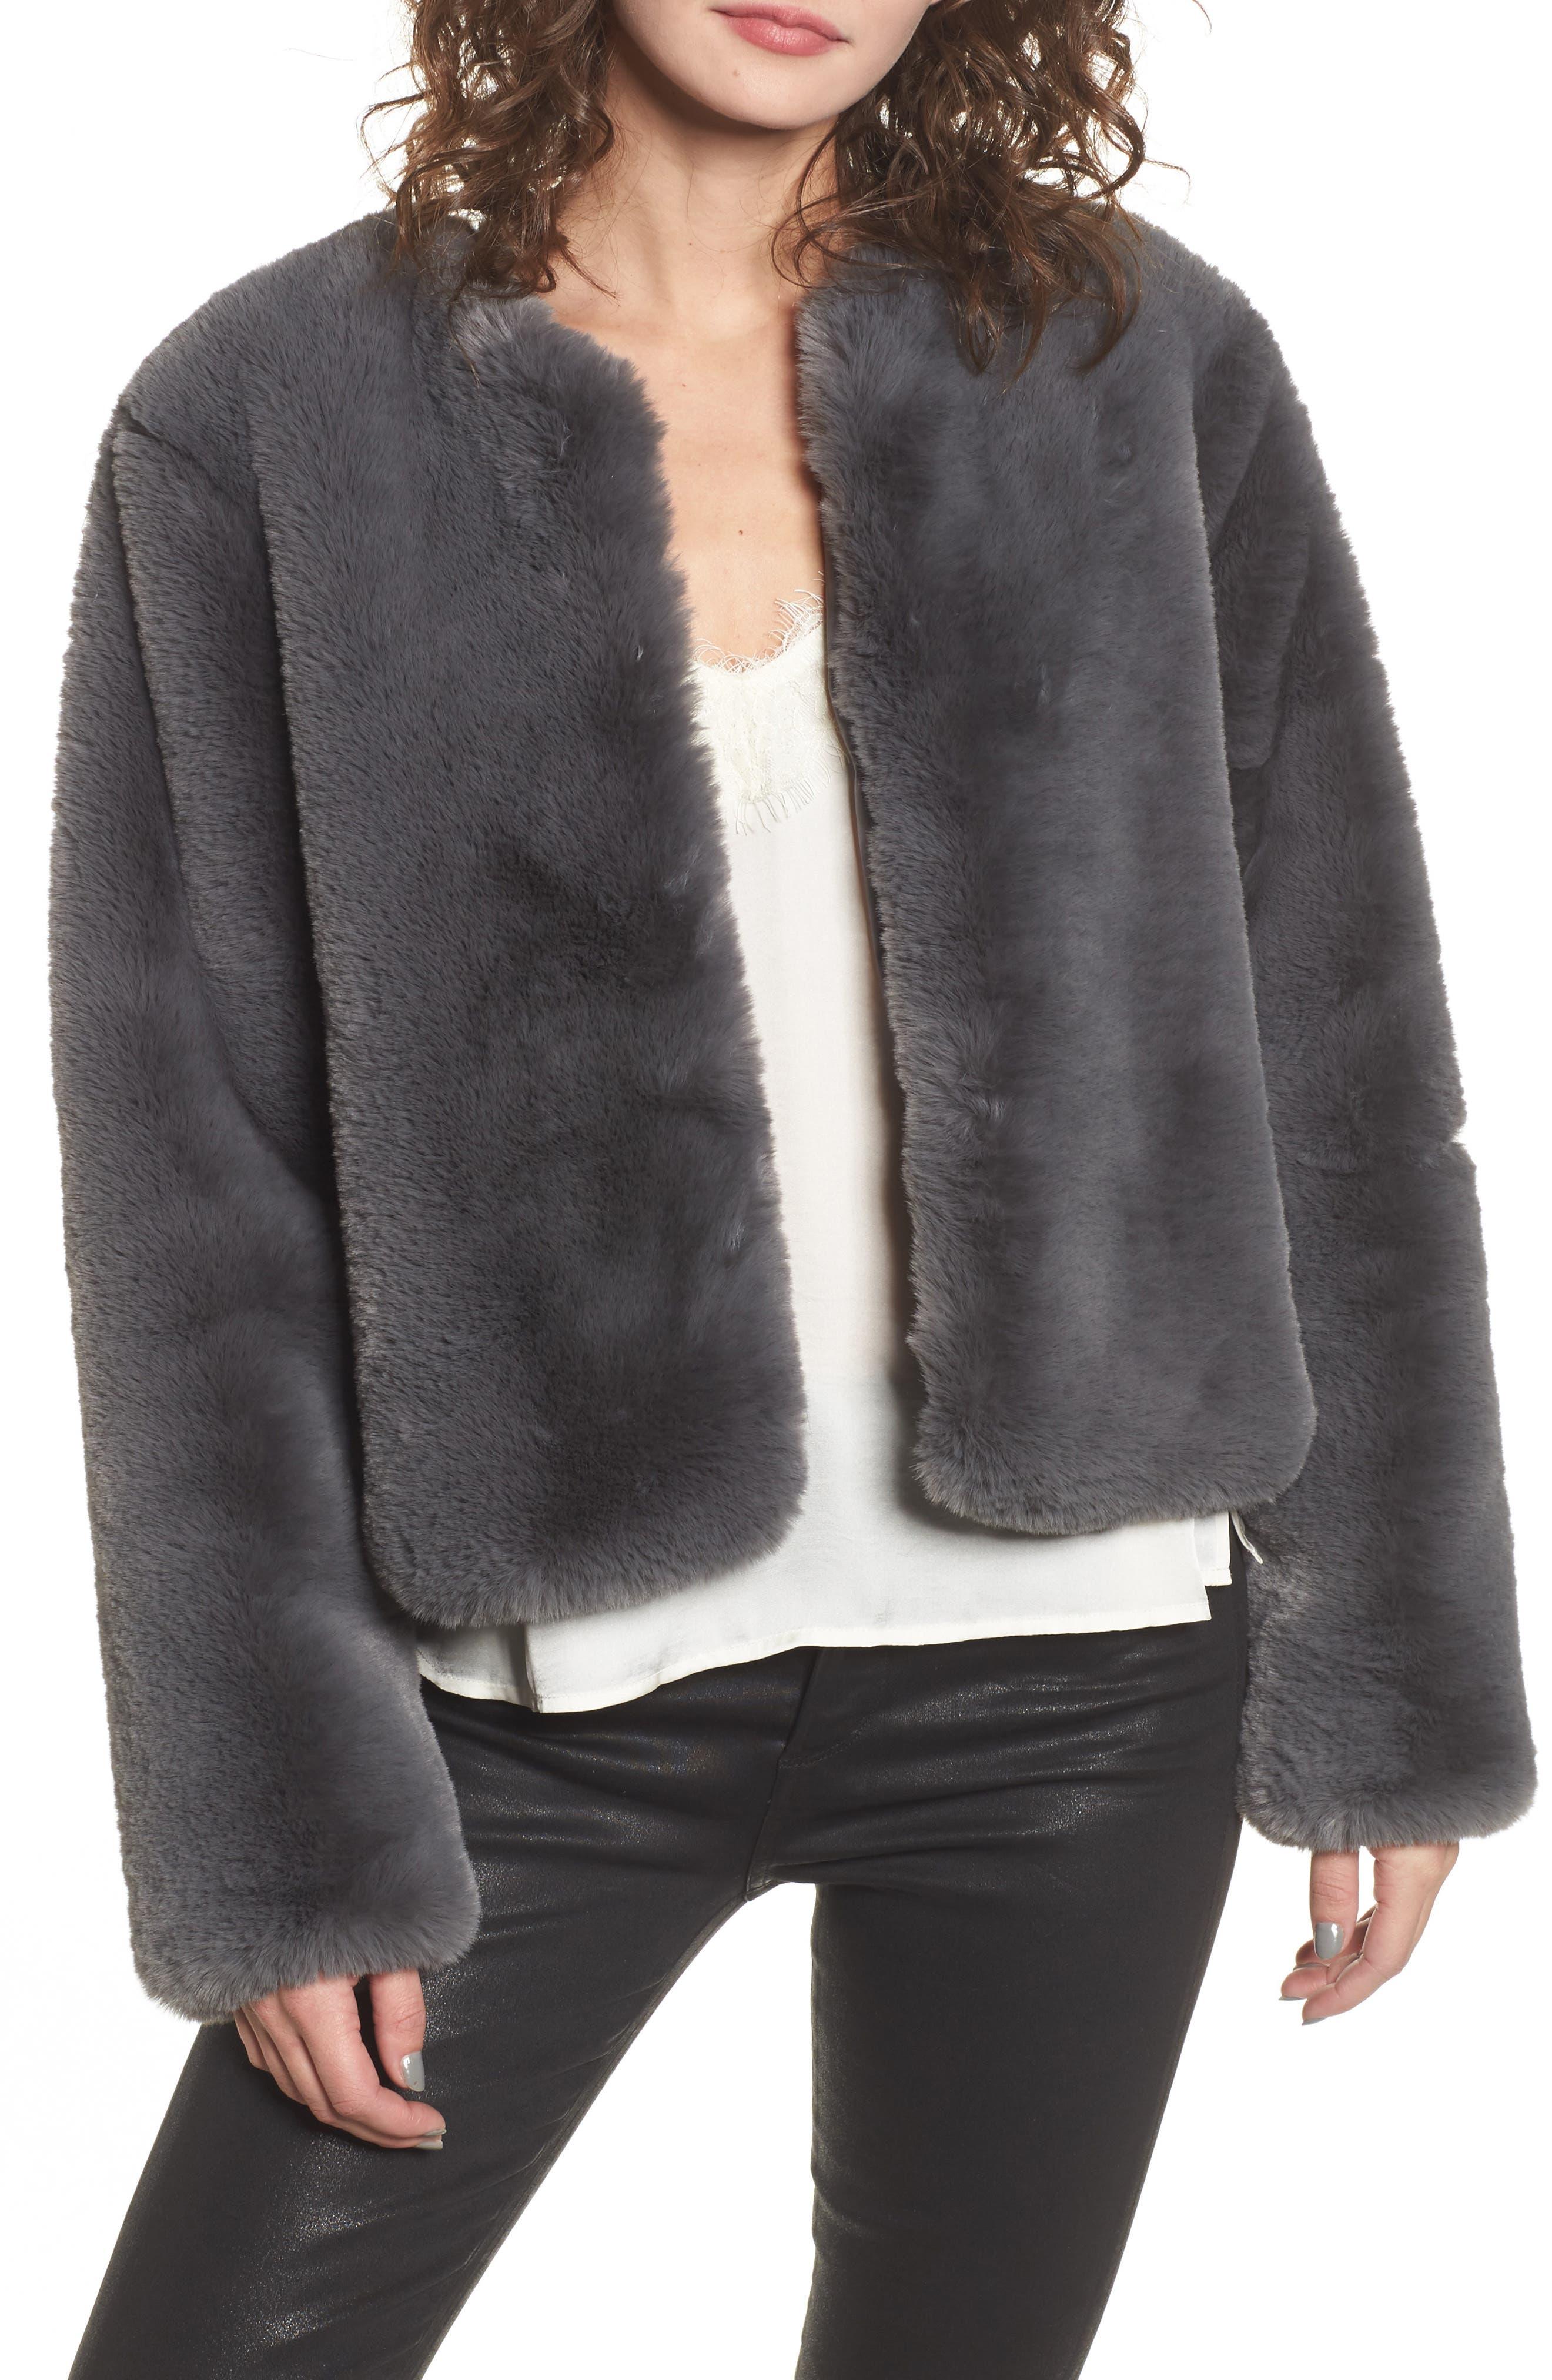 Main Image - MOON RIVER Faux Fur Jacket